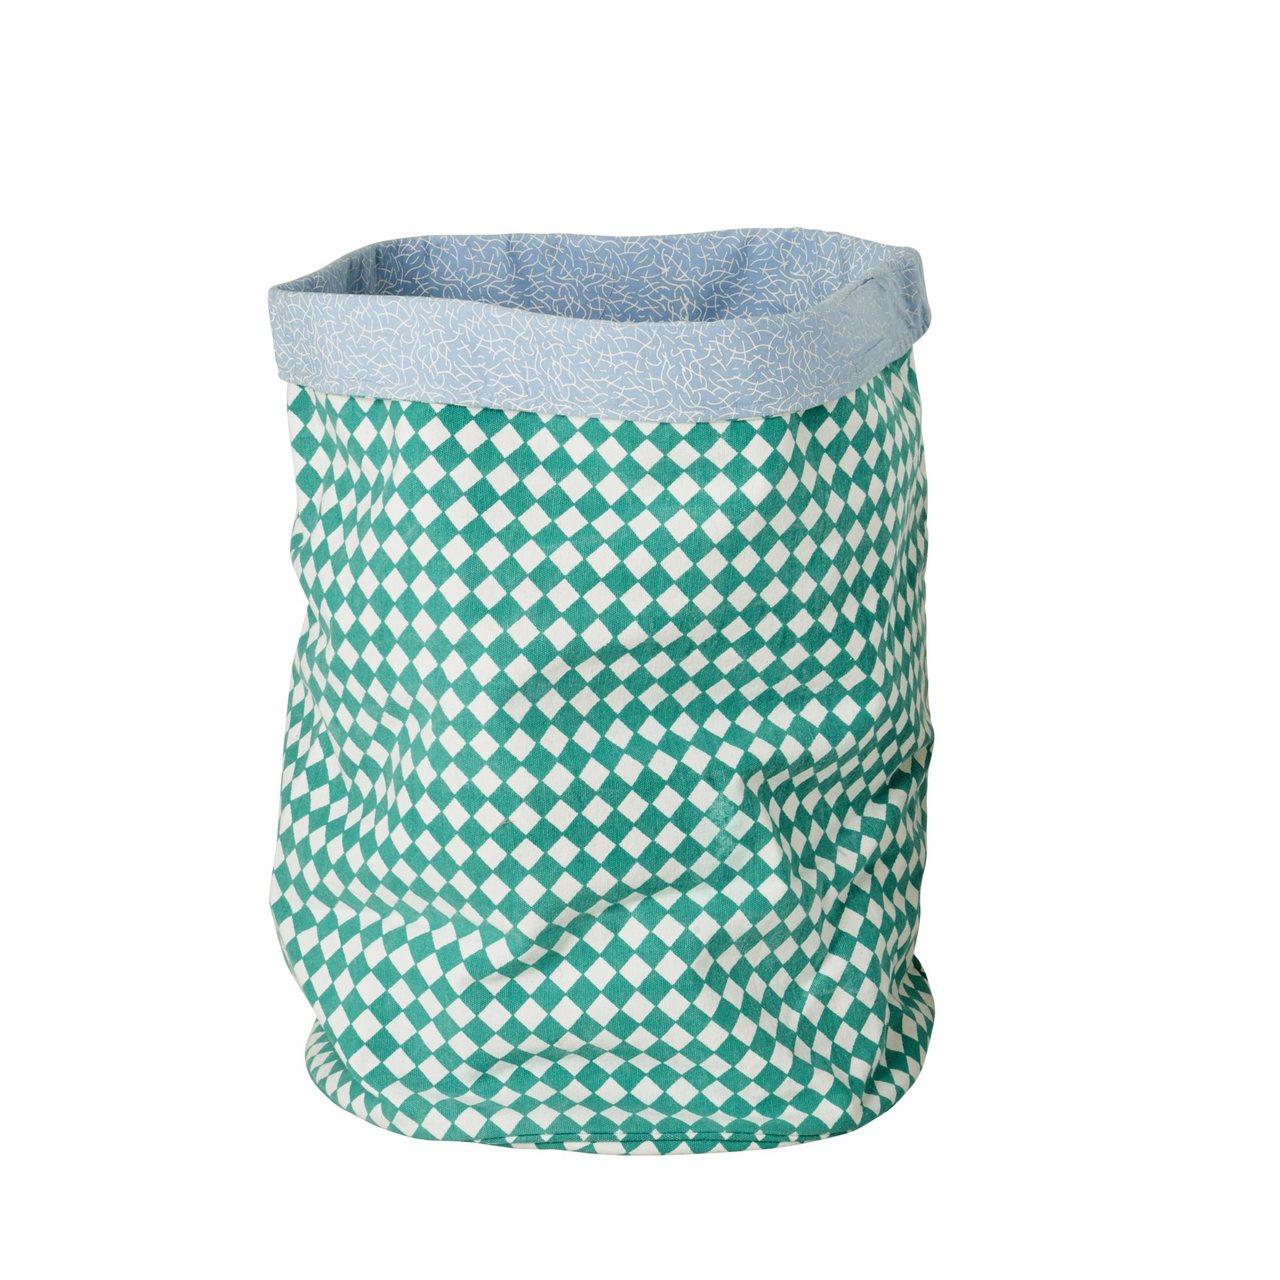 Kids fabric storage, small